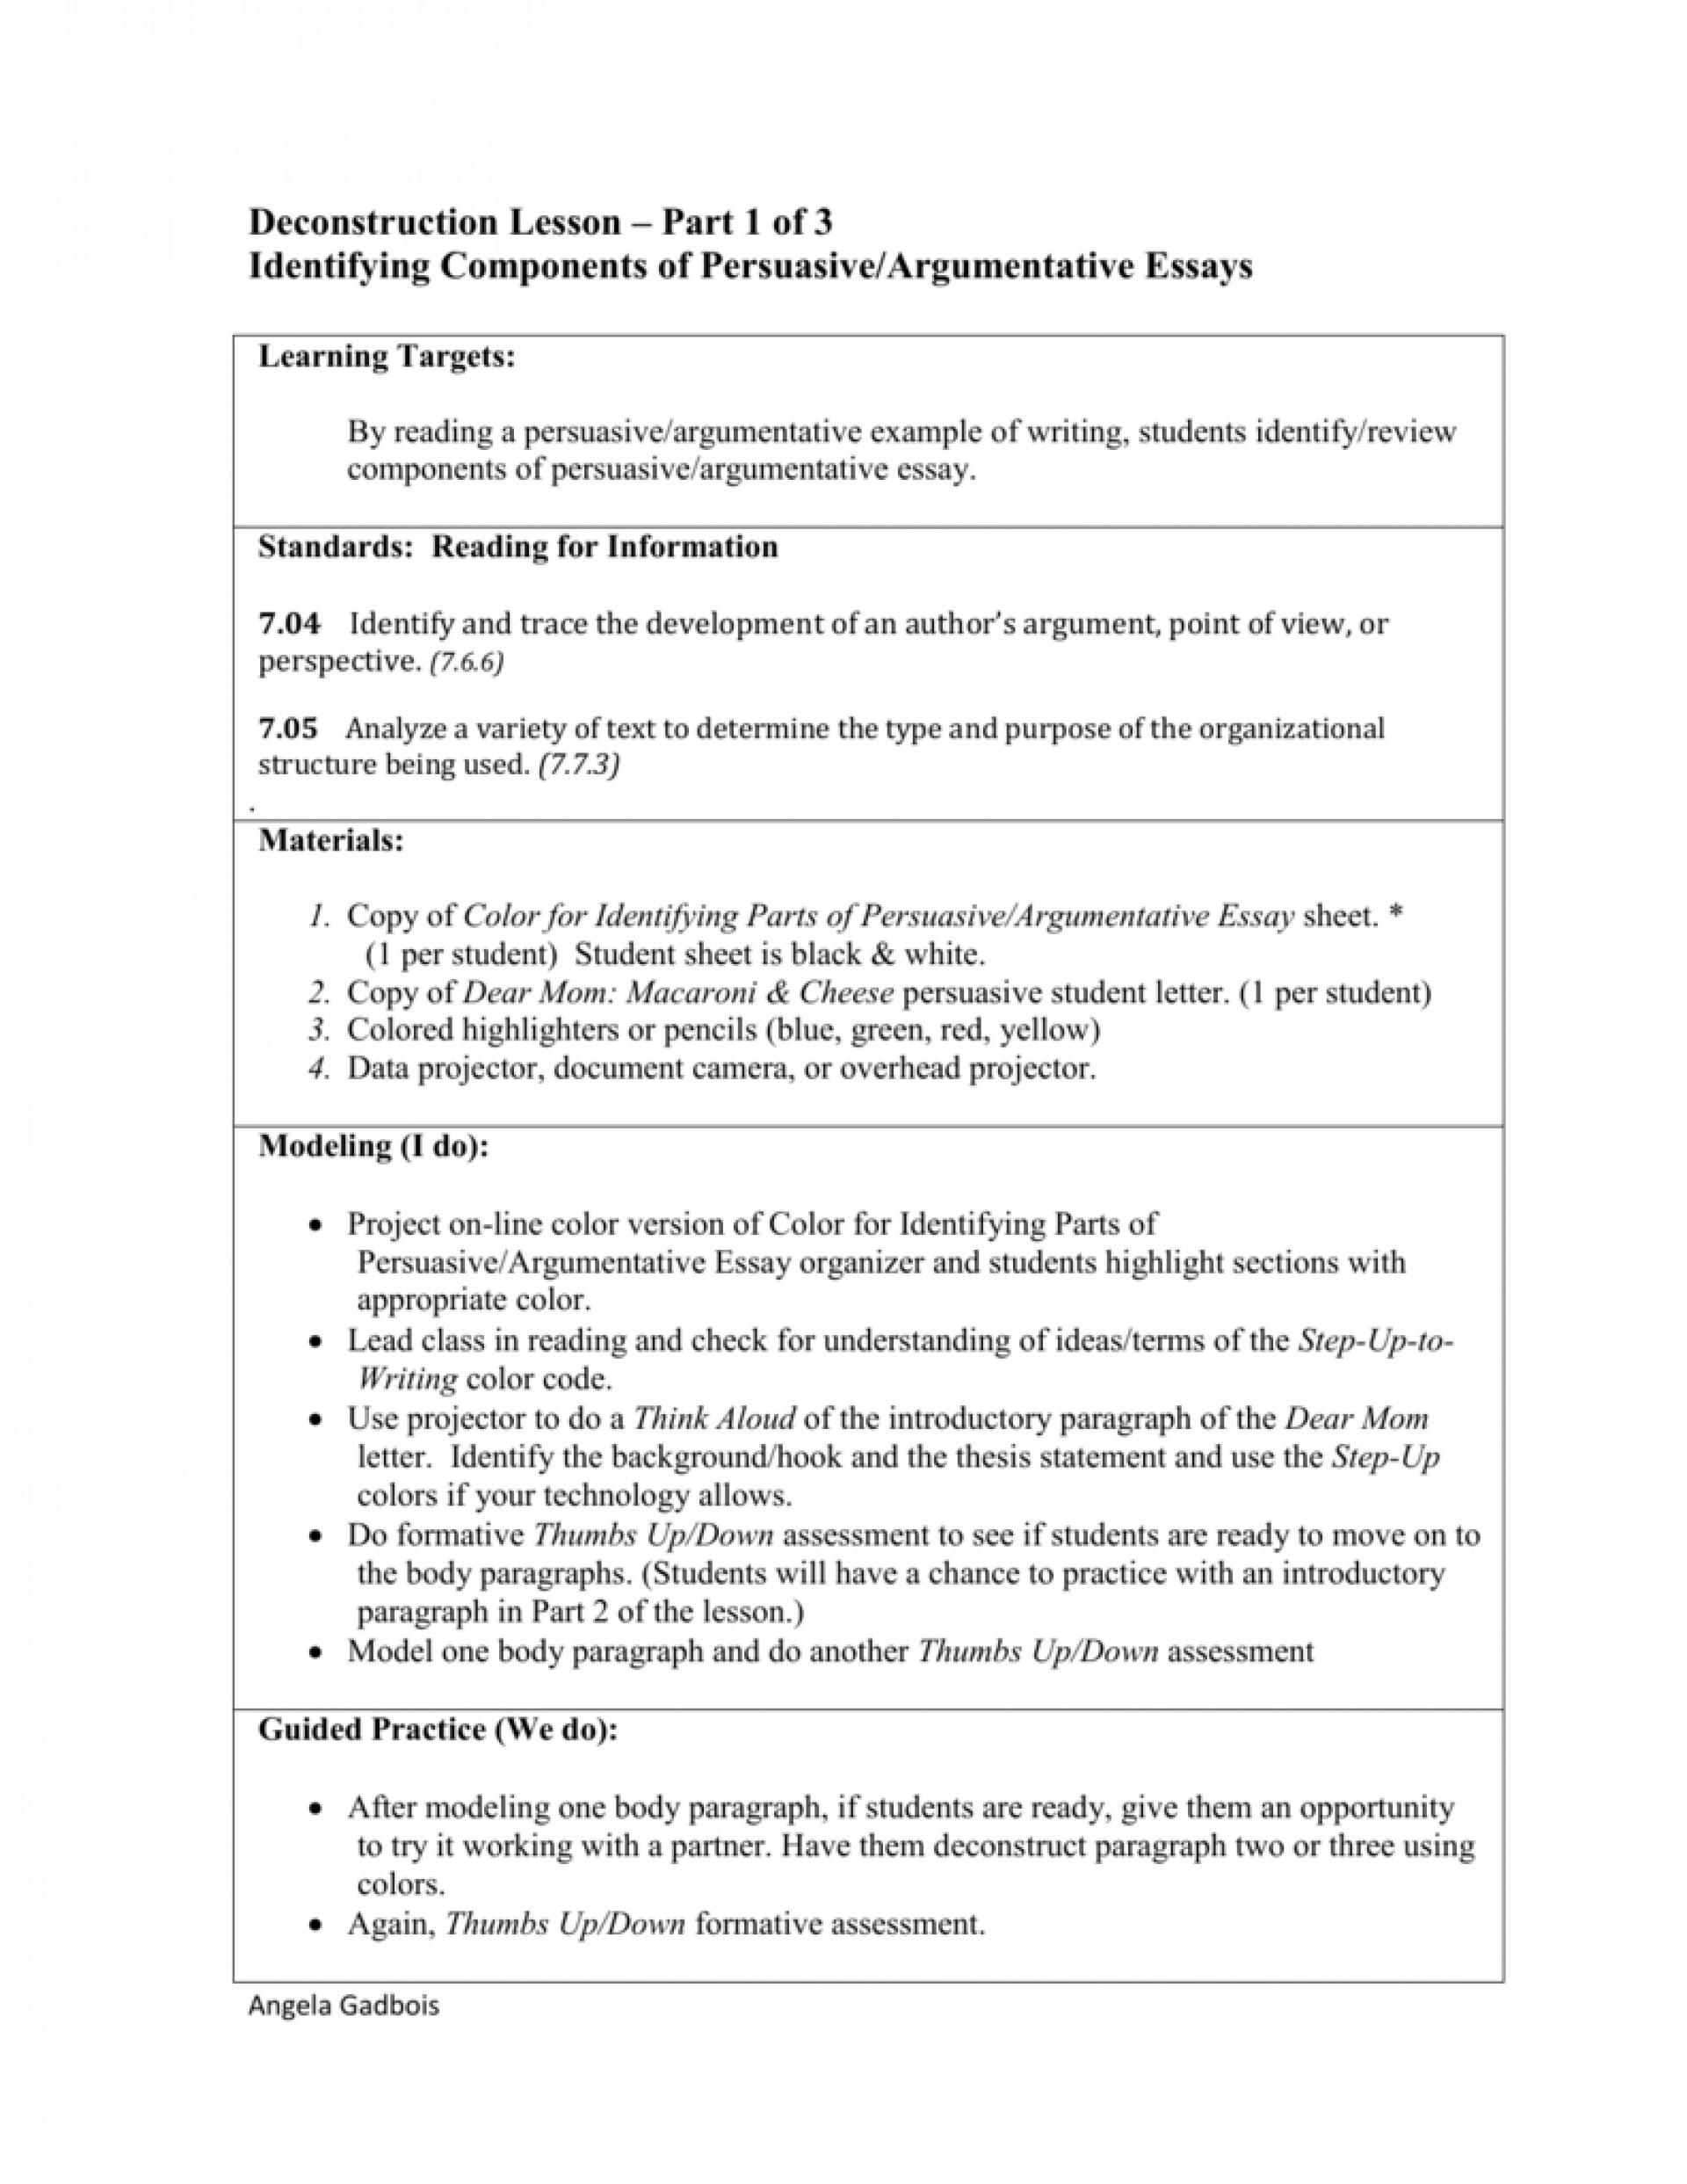 008 Essay Example 008053854 1 Parts Of Imposing 6 A Persuasive 1920